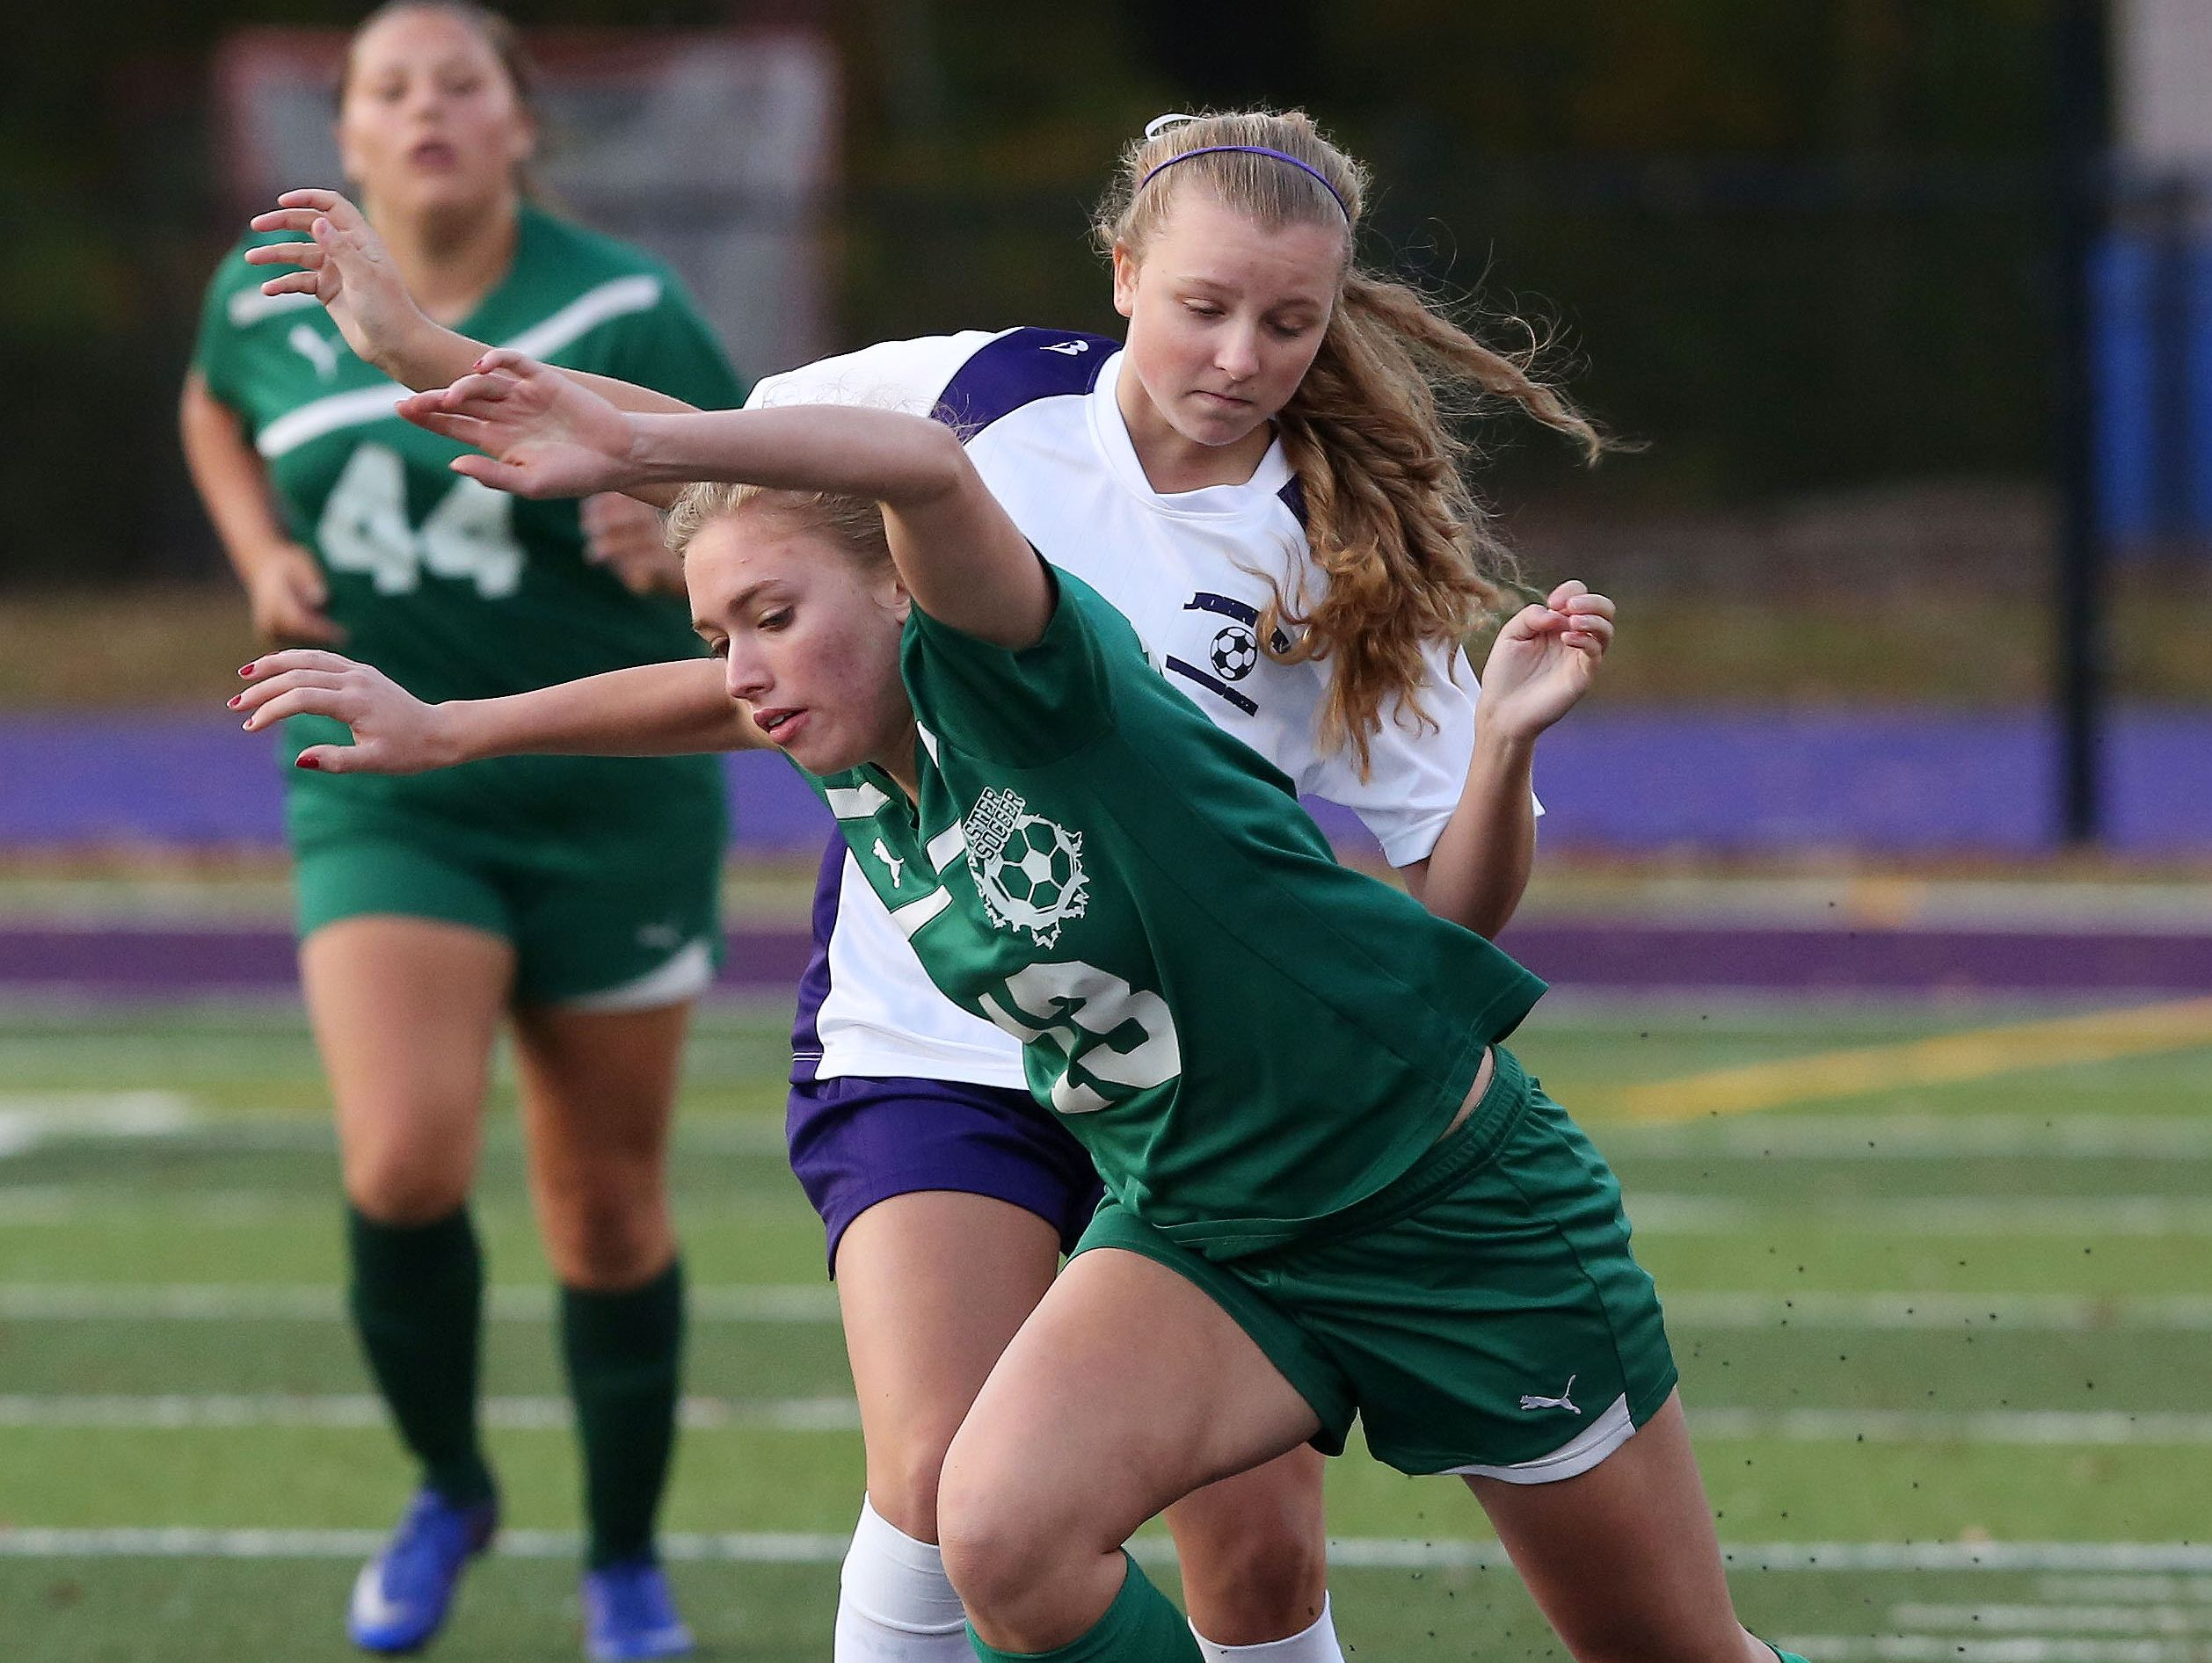 John Jay's Hannah Dieck (16) and Brewster's Tara Regan (13) battle for ball control during a soccer game at John Jay High School in Cross River Oct. 13, 2016. John Jay won the game 6-0.